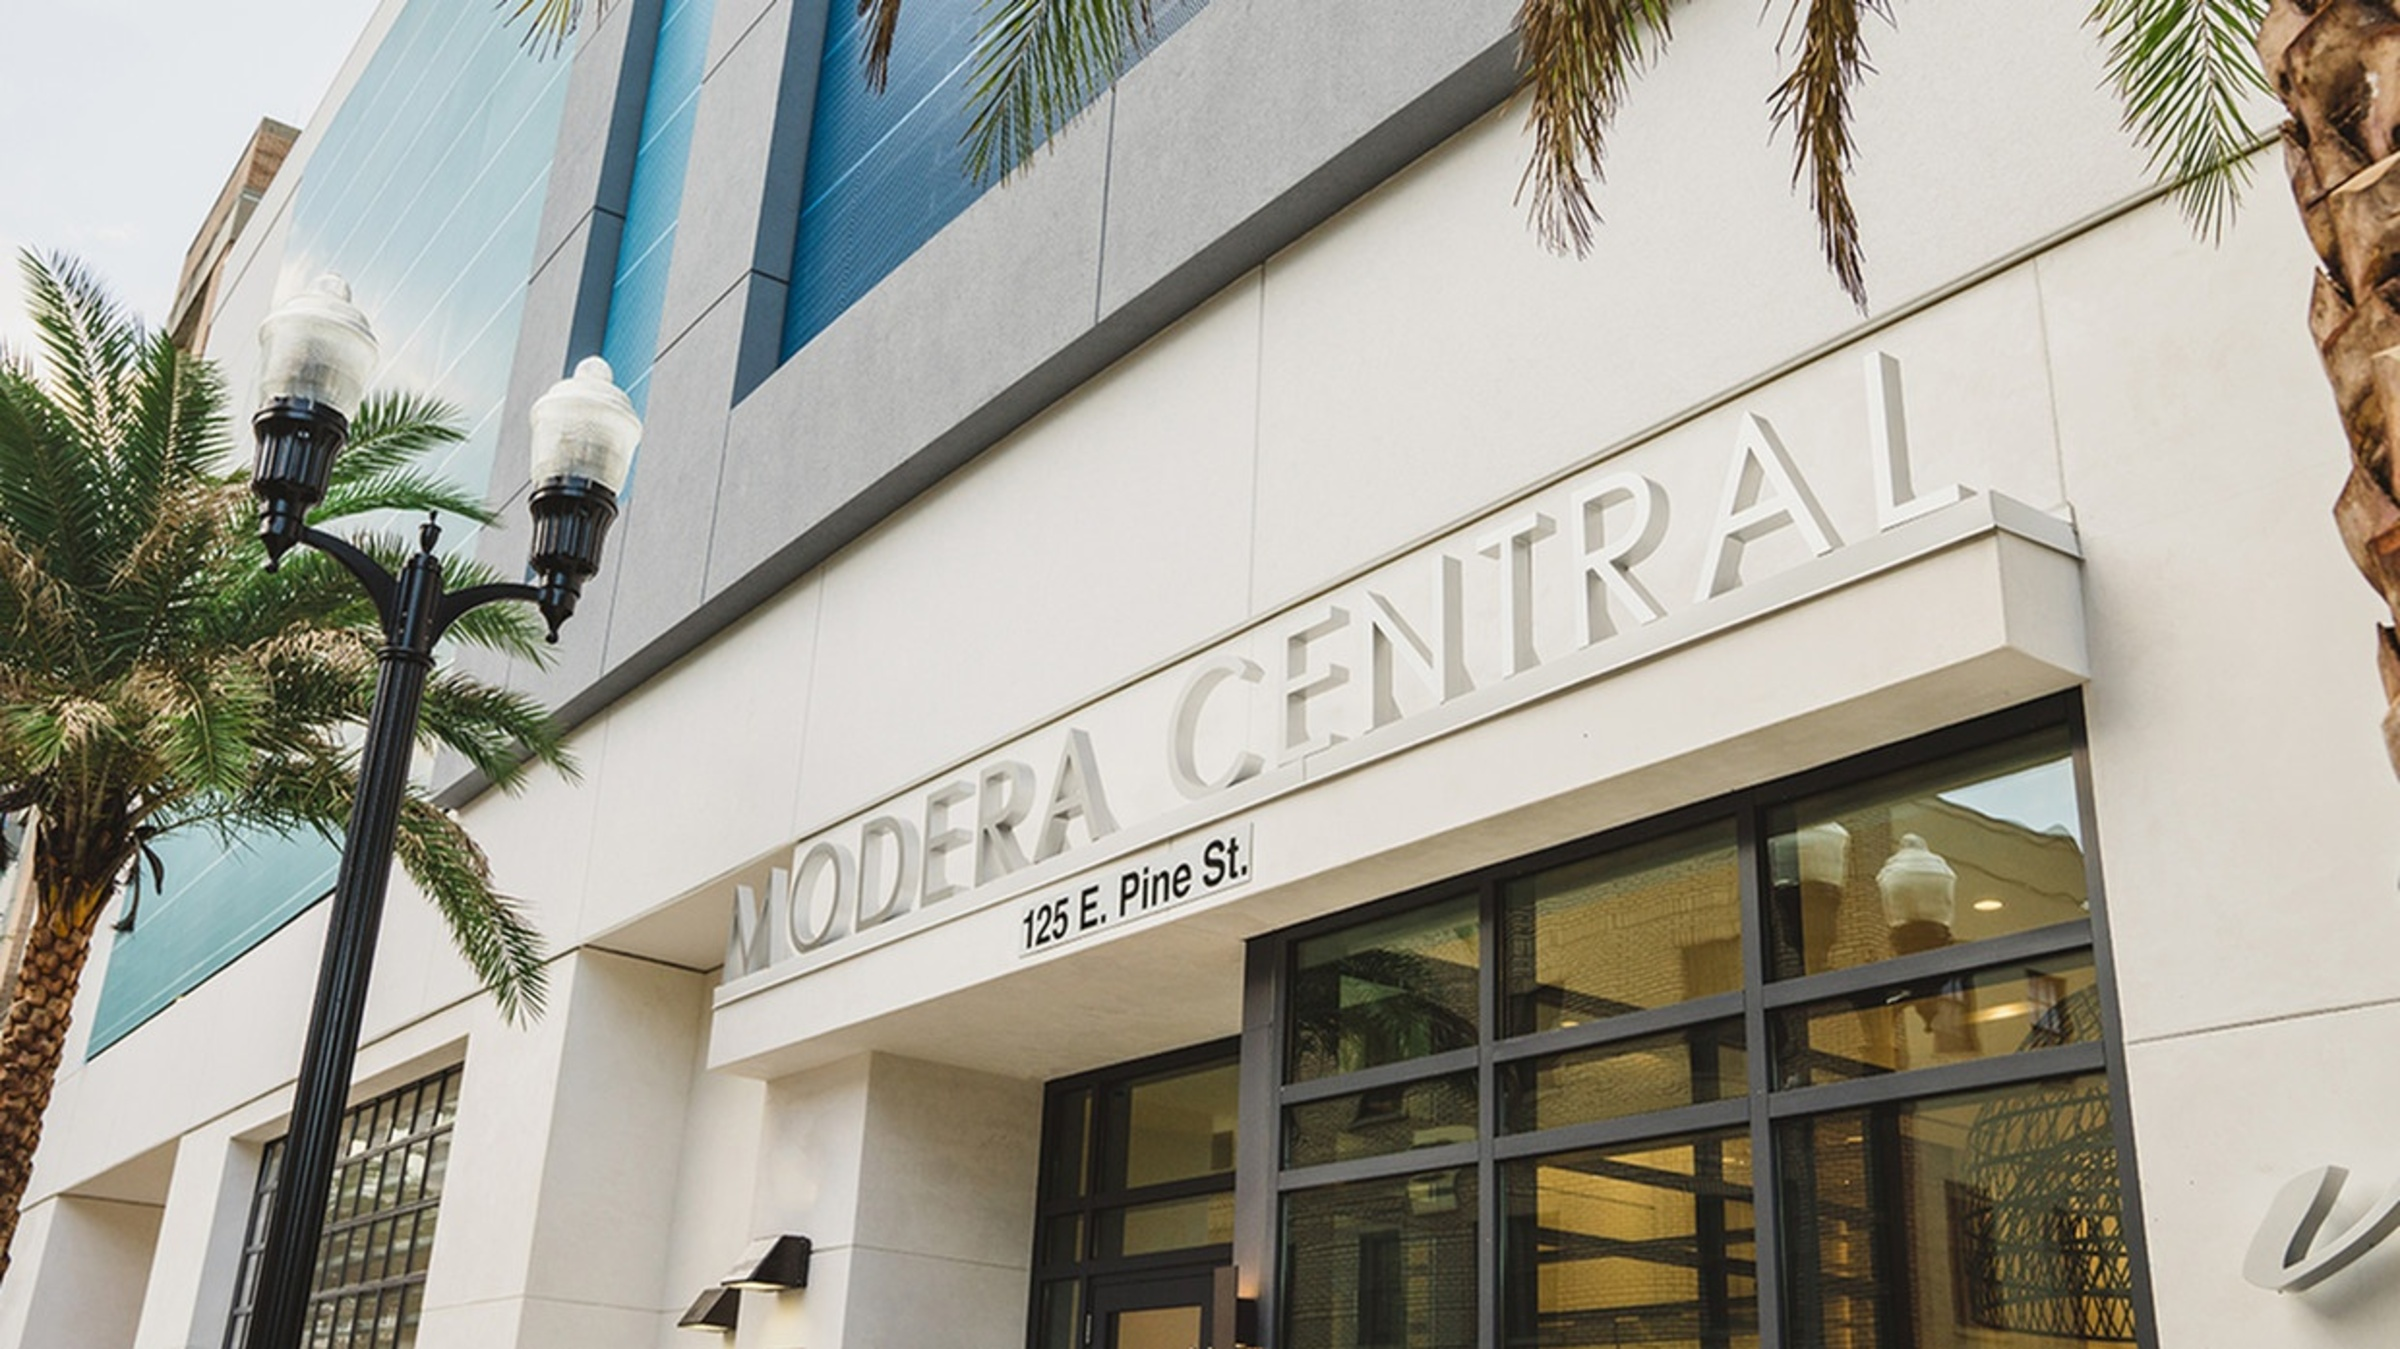 Modera Central